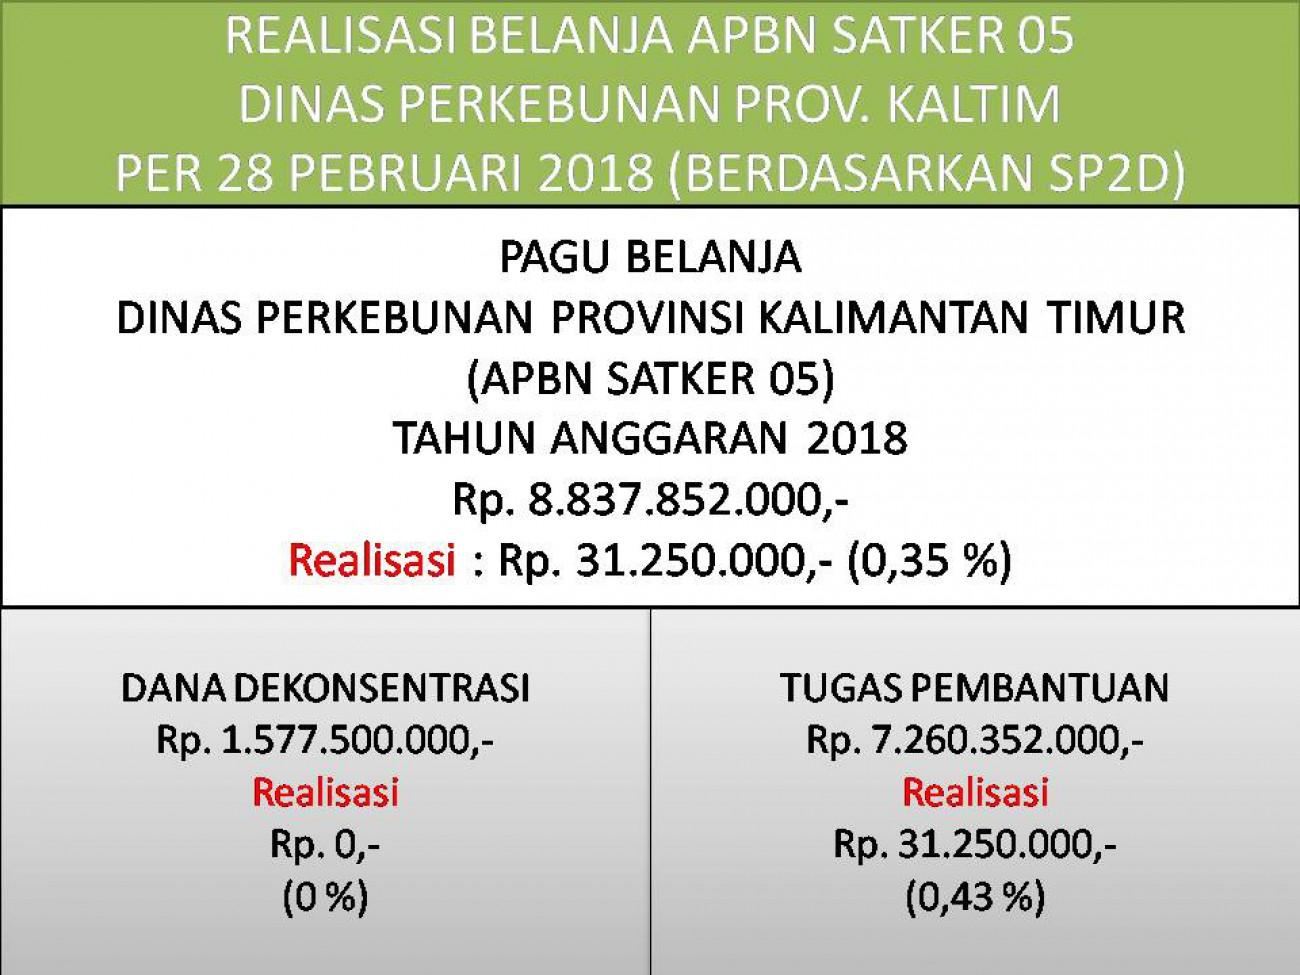 Laporan Realisasi APBN Satker 05 (Direktorat Jenderal Perkebunan) Dinas Perkebunan Prov. Kaltim Bulan Februari 2018